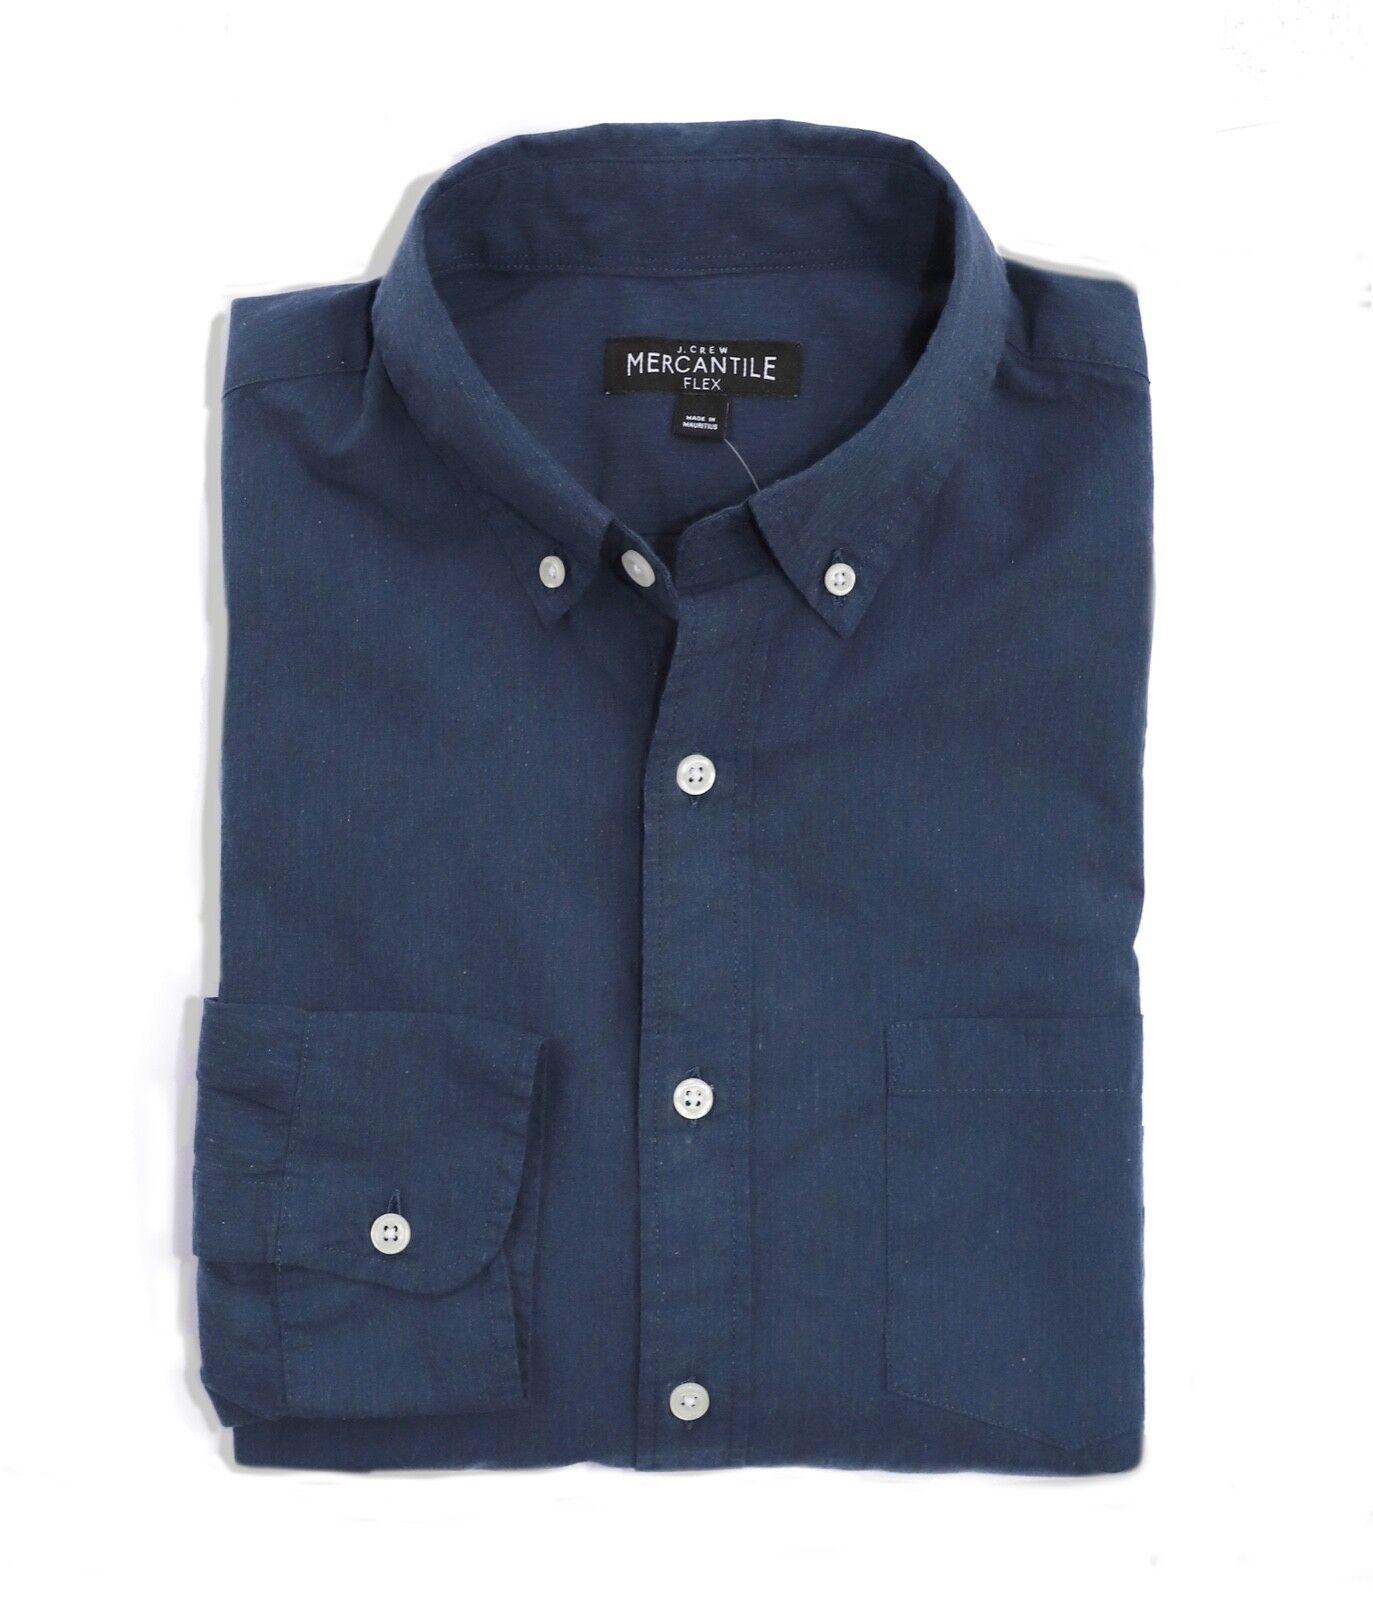 J.Crew Mercantile Mens XS Slim Fit - Light-Weight Indigo Flex Washed Shirt